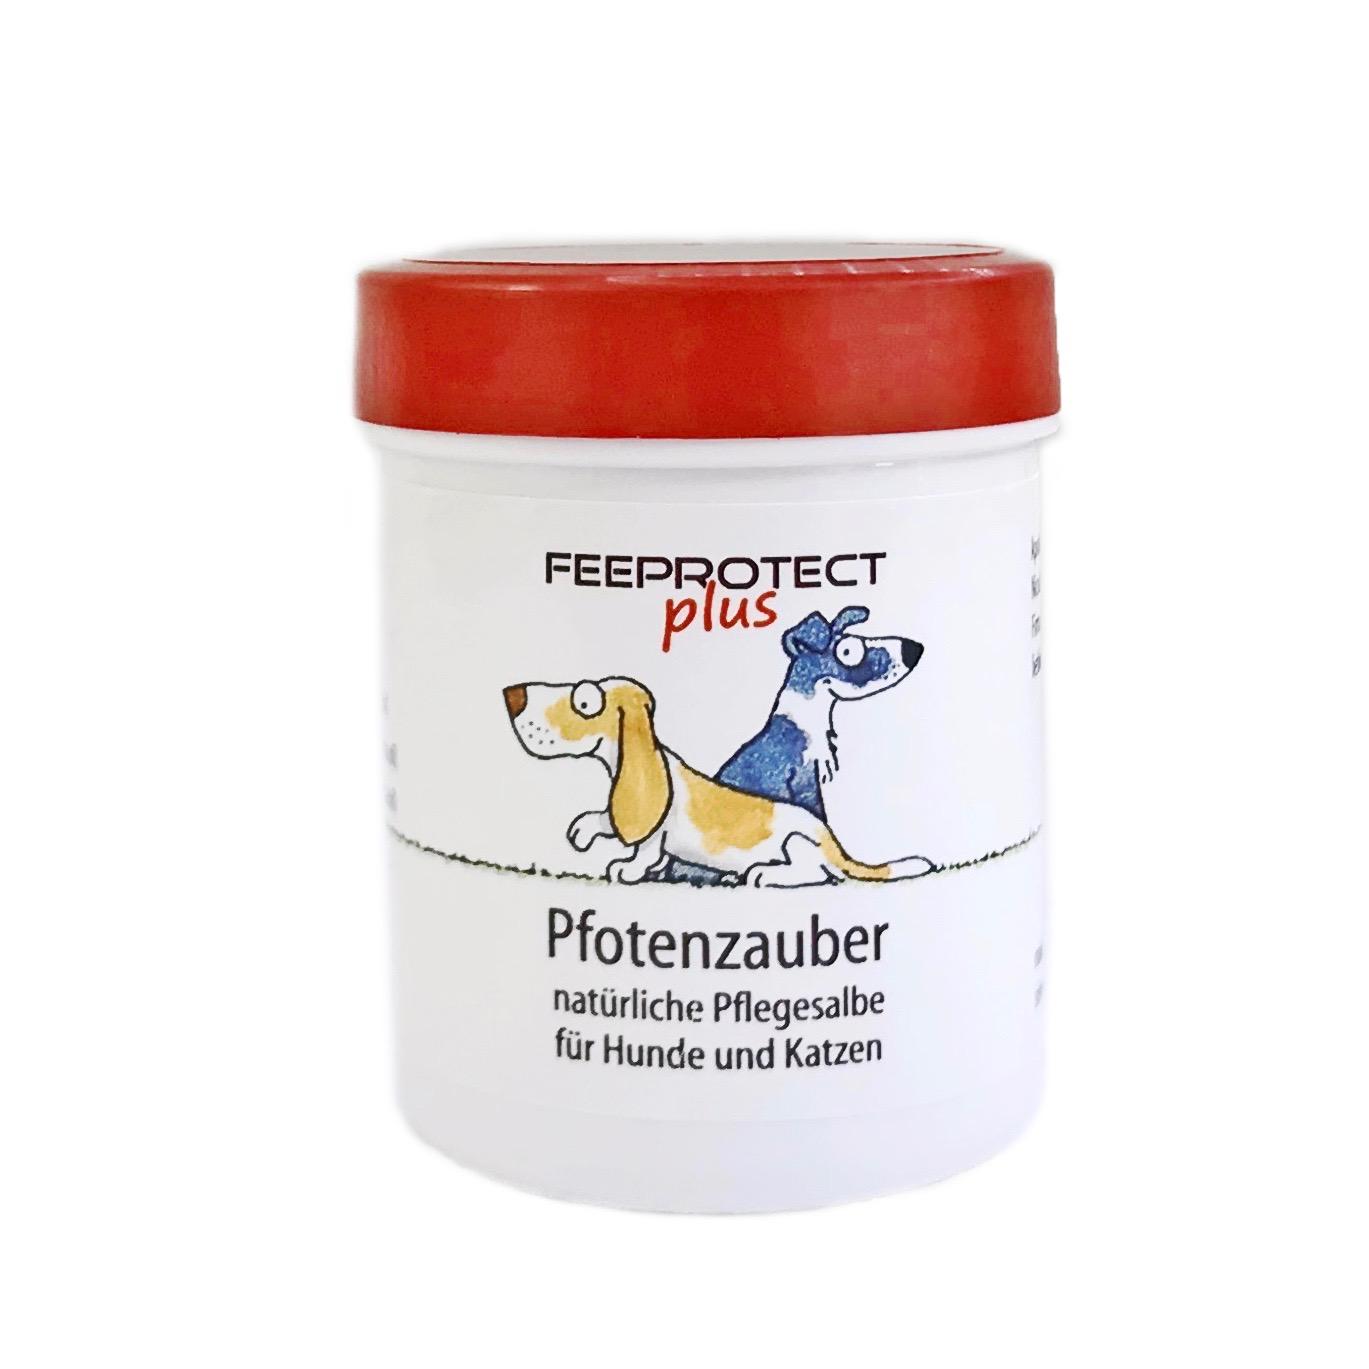 Feeprotect ® Pfotenzauber-Salbe mit Niemöl